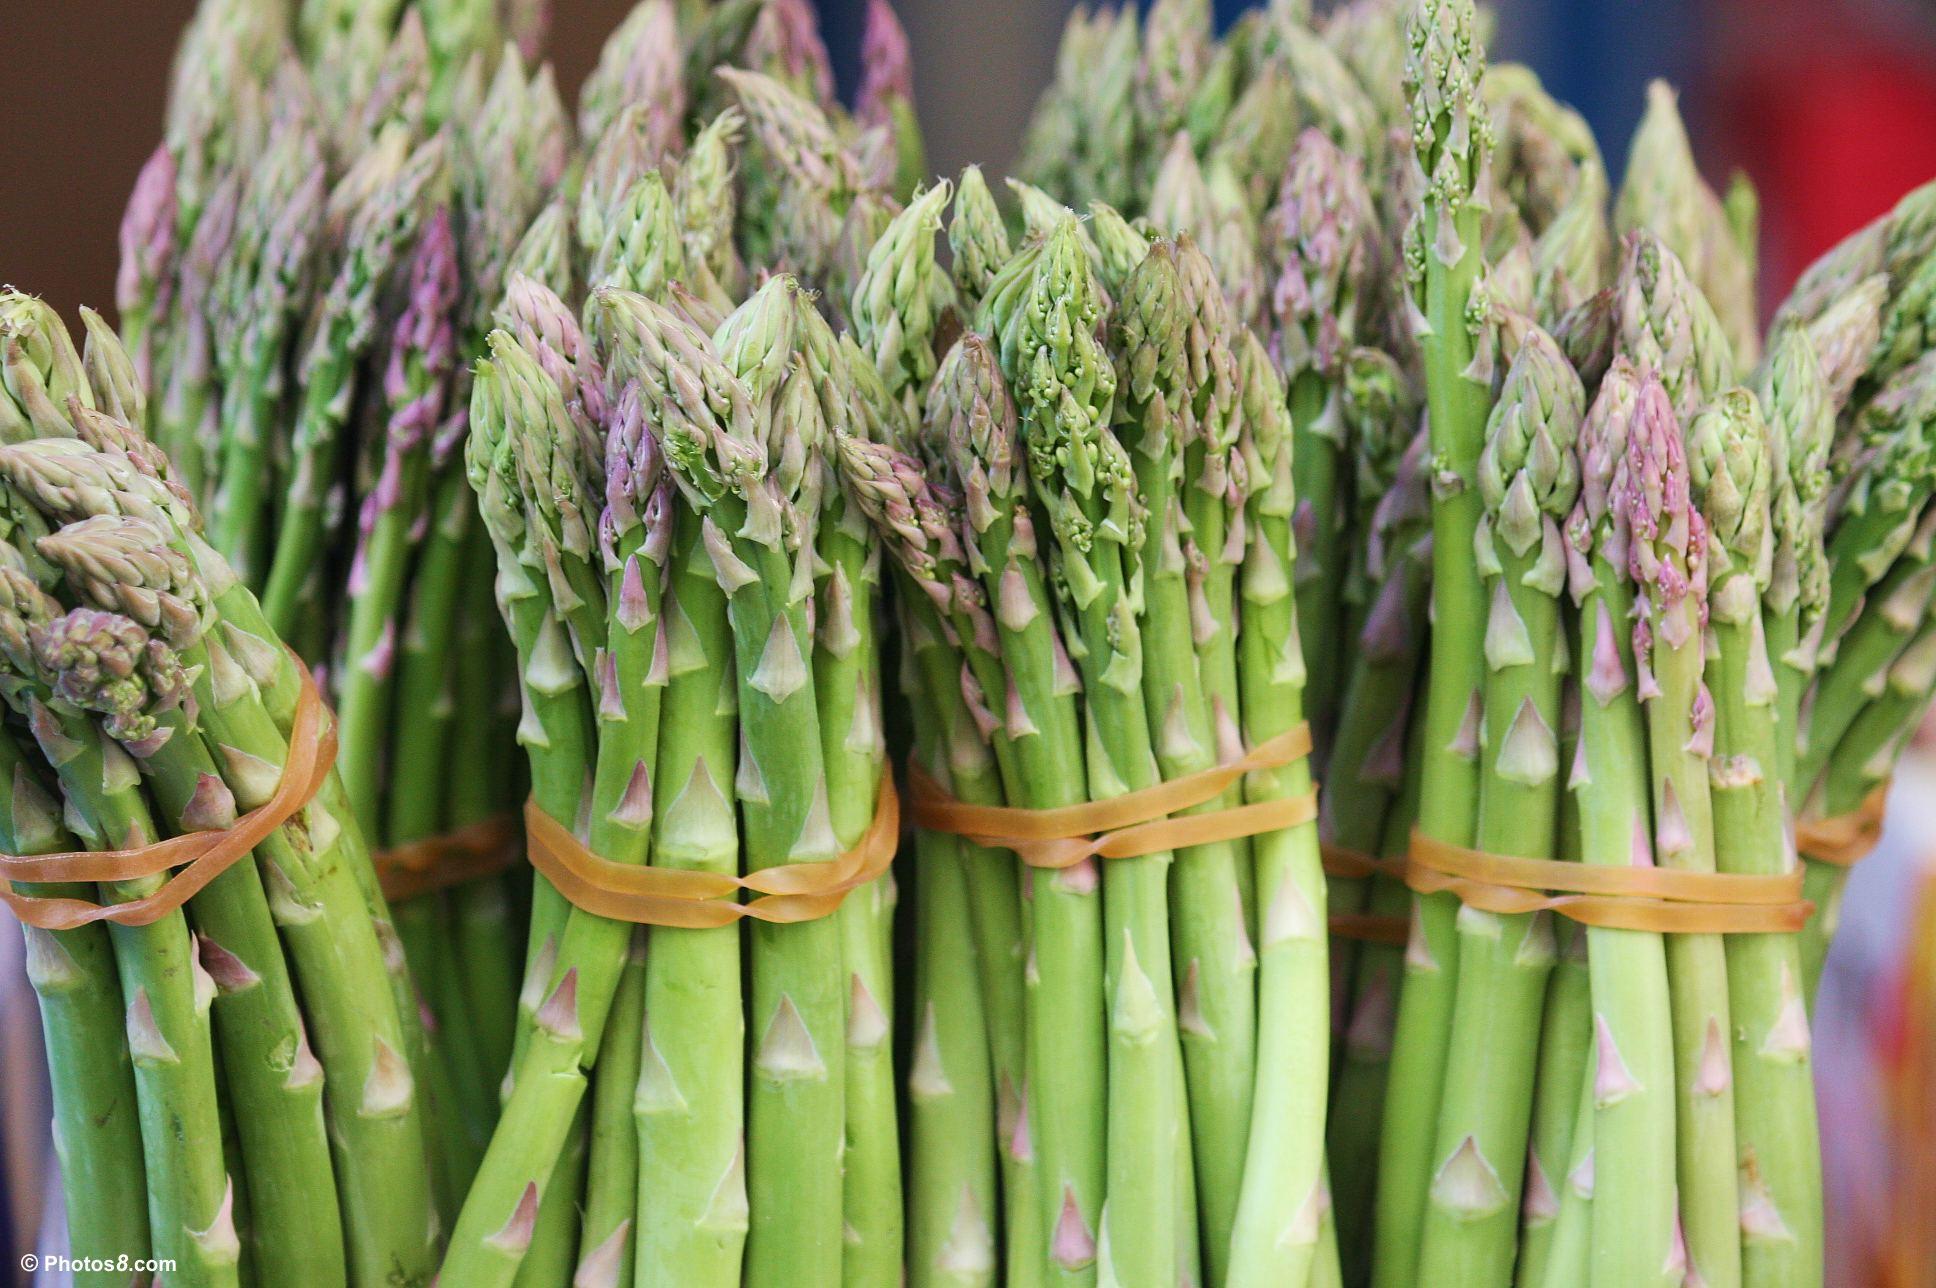 Summer Vegetables: Asparagus | Let's Get Homey, Homies!